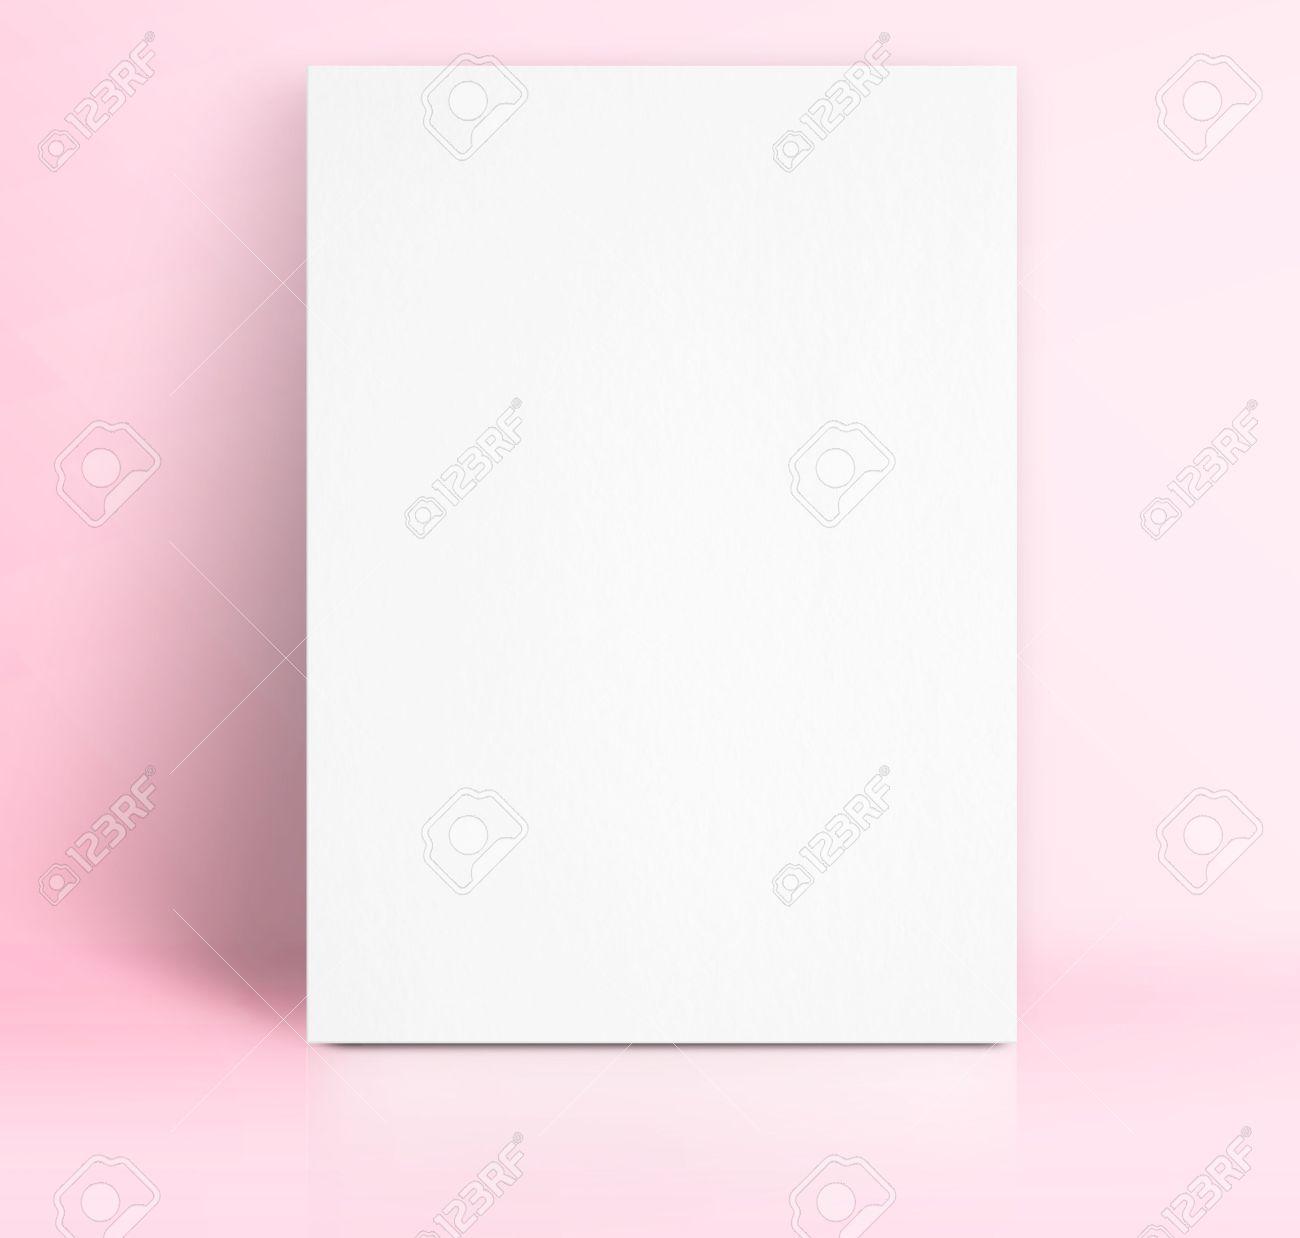 Black White Paper Poster Lean At Pastel Pink Color Studio Room ...